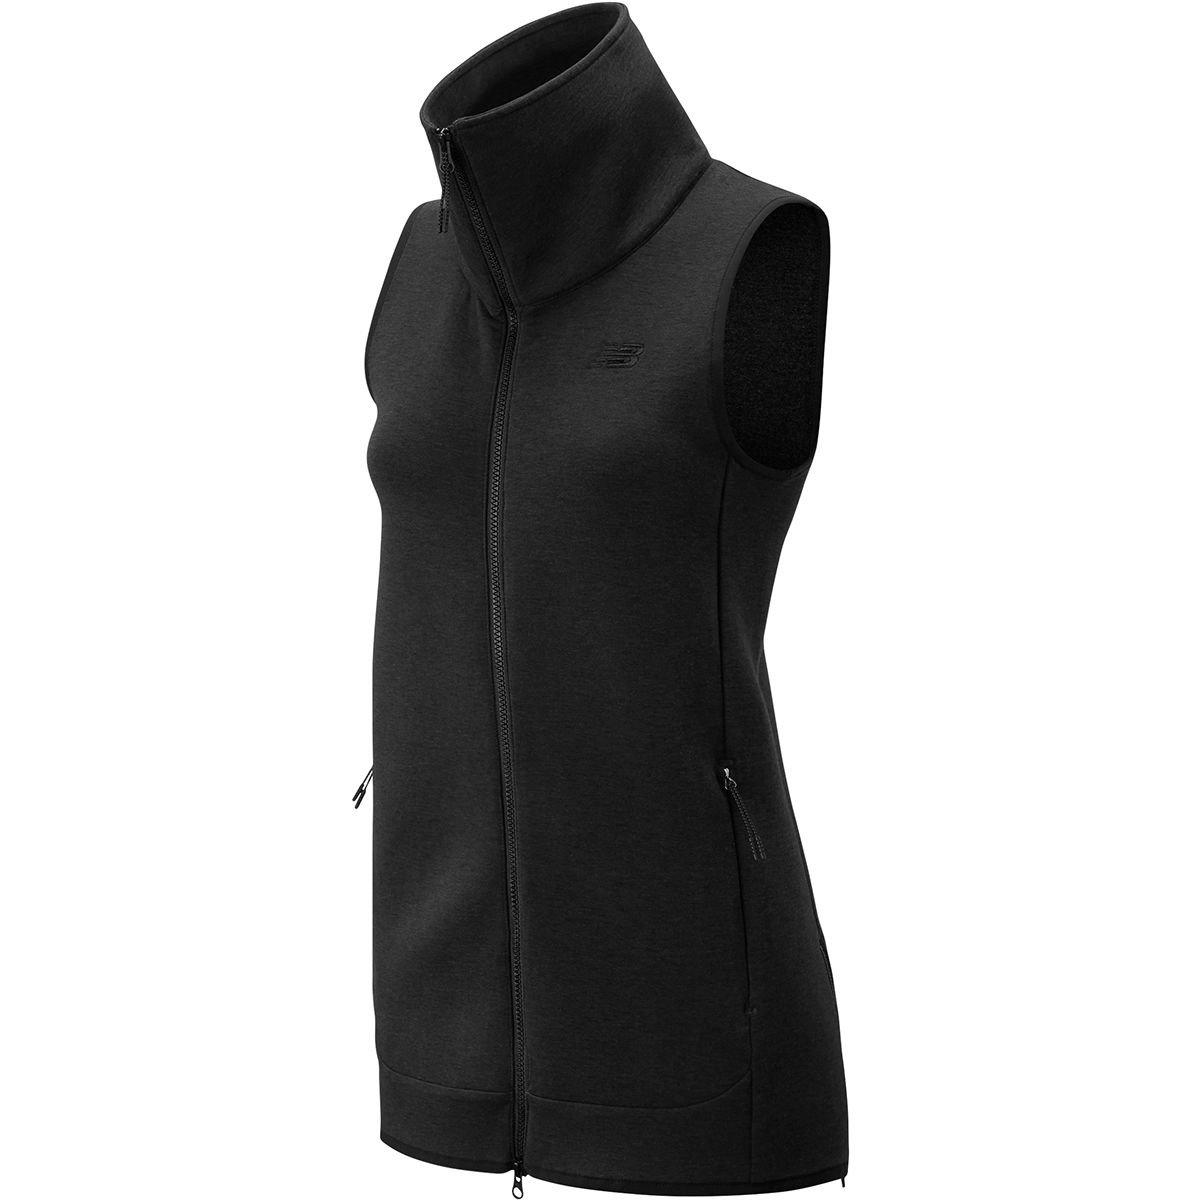 New Balance Women's Luxe Vest